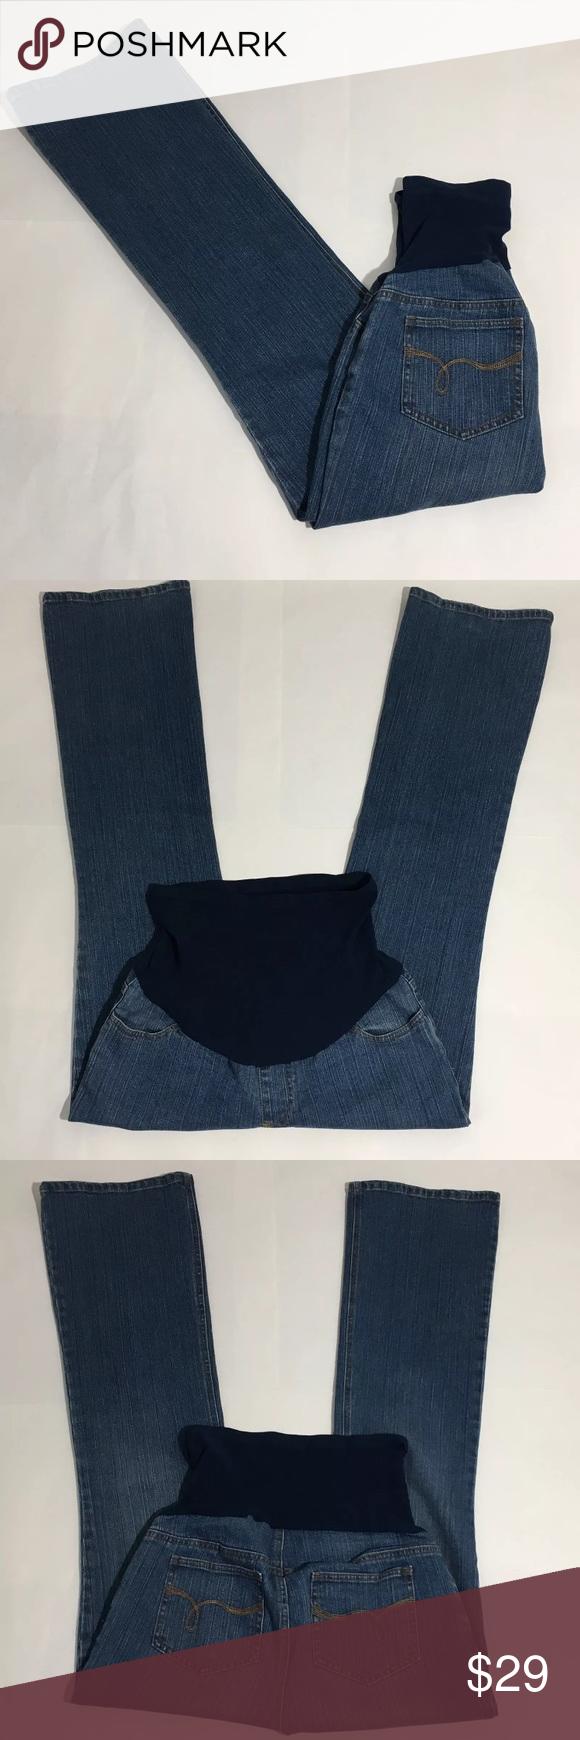 "Motherhood Maternity Bootcut Jeans Full Panel M Motherhood Maternity medium wash bootcut full panel jeans. Size M. 32"" inseam. Motherhood Maternity Jeans Boot Cut"